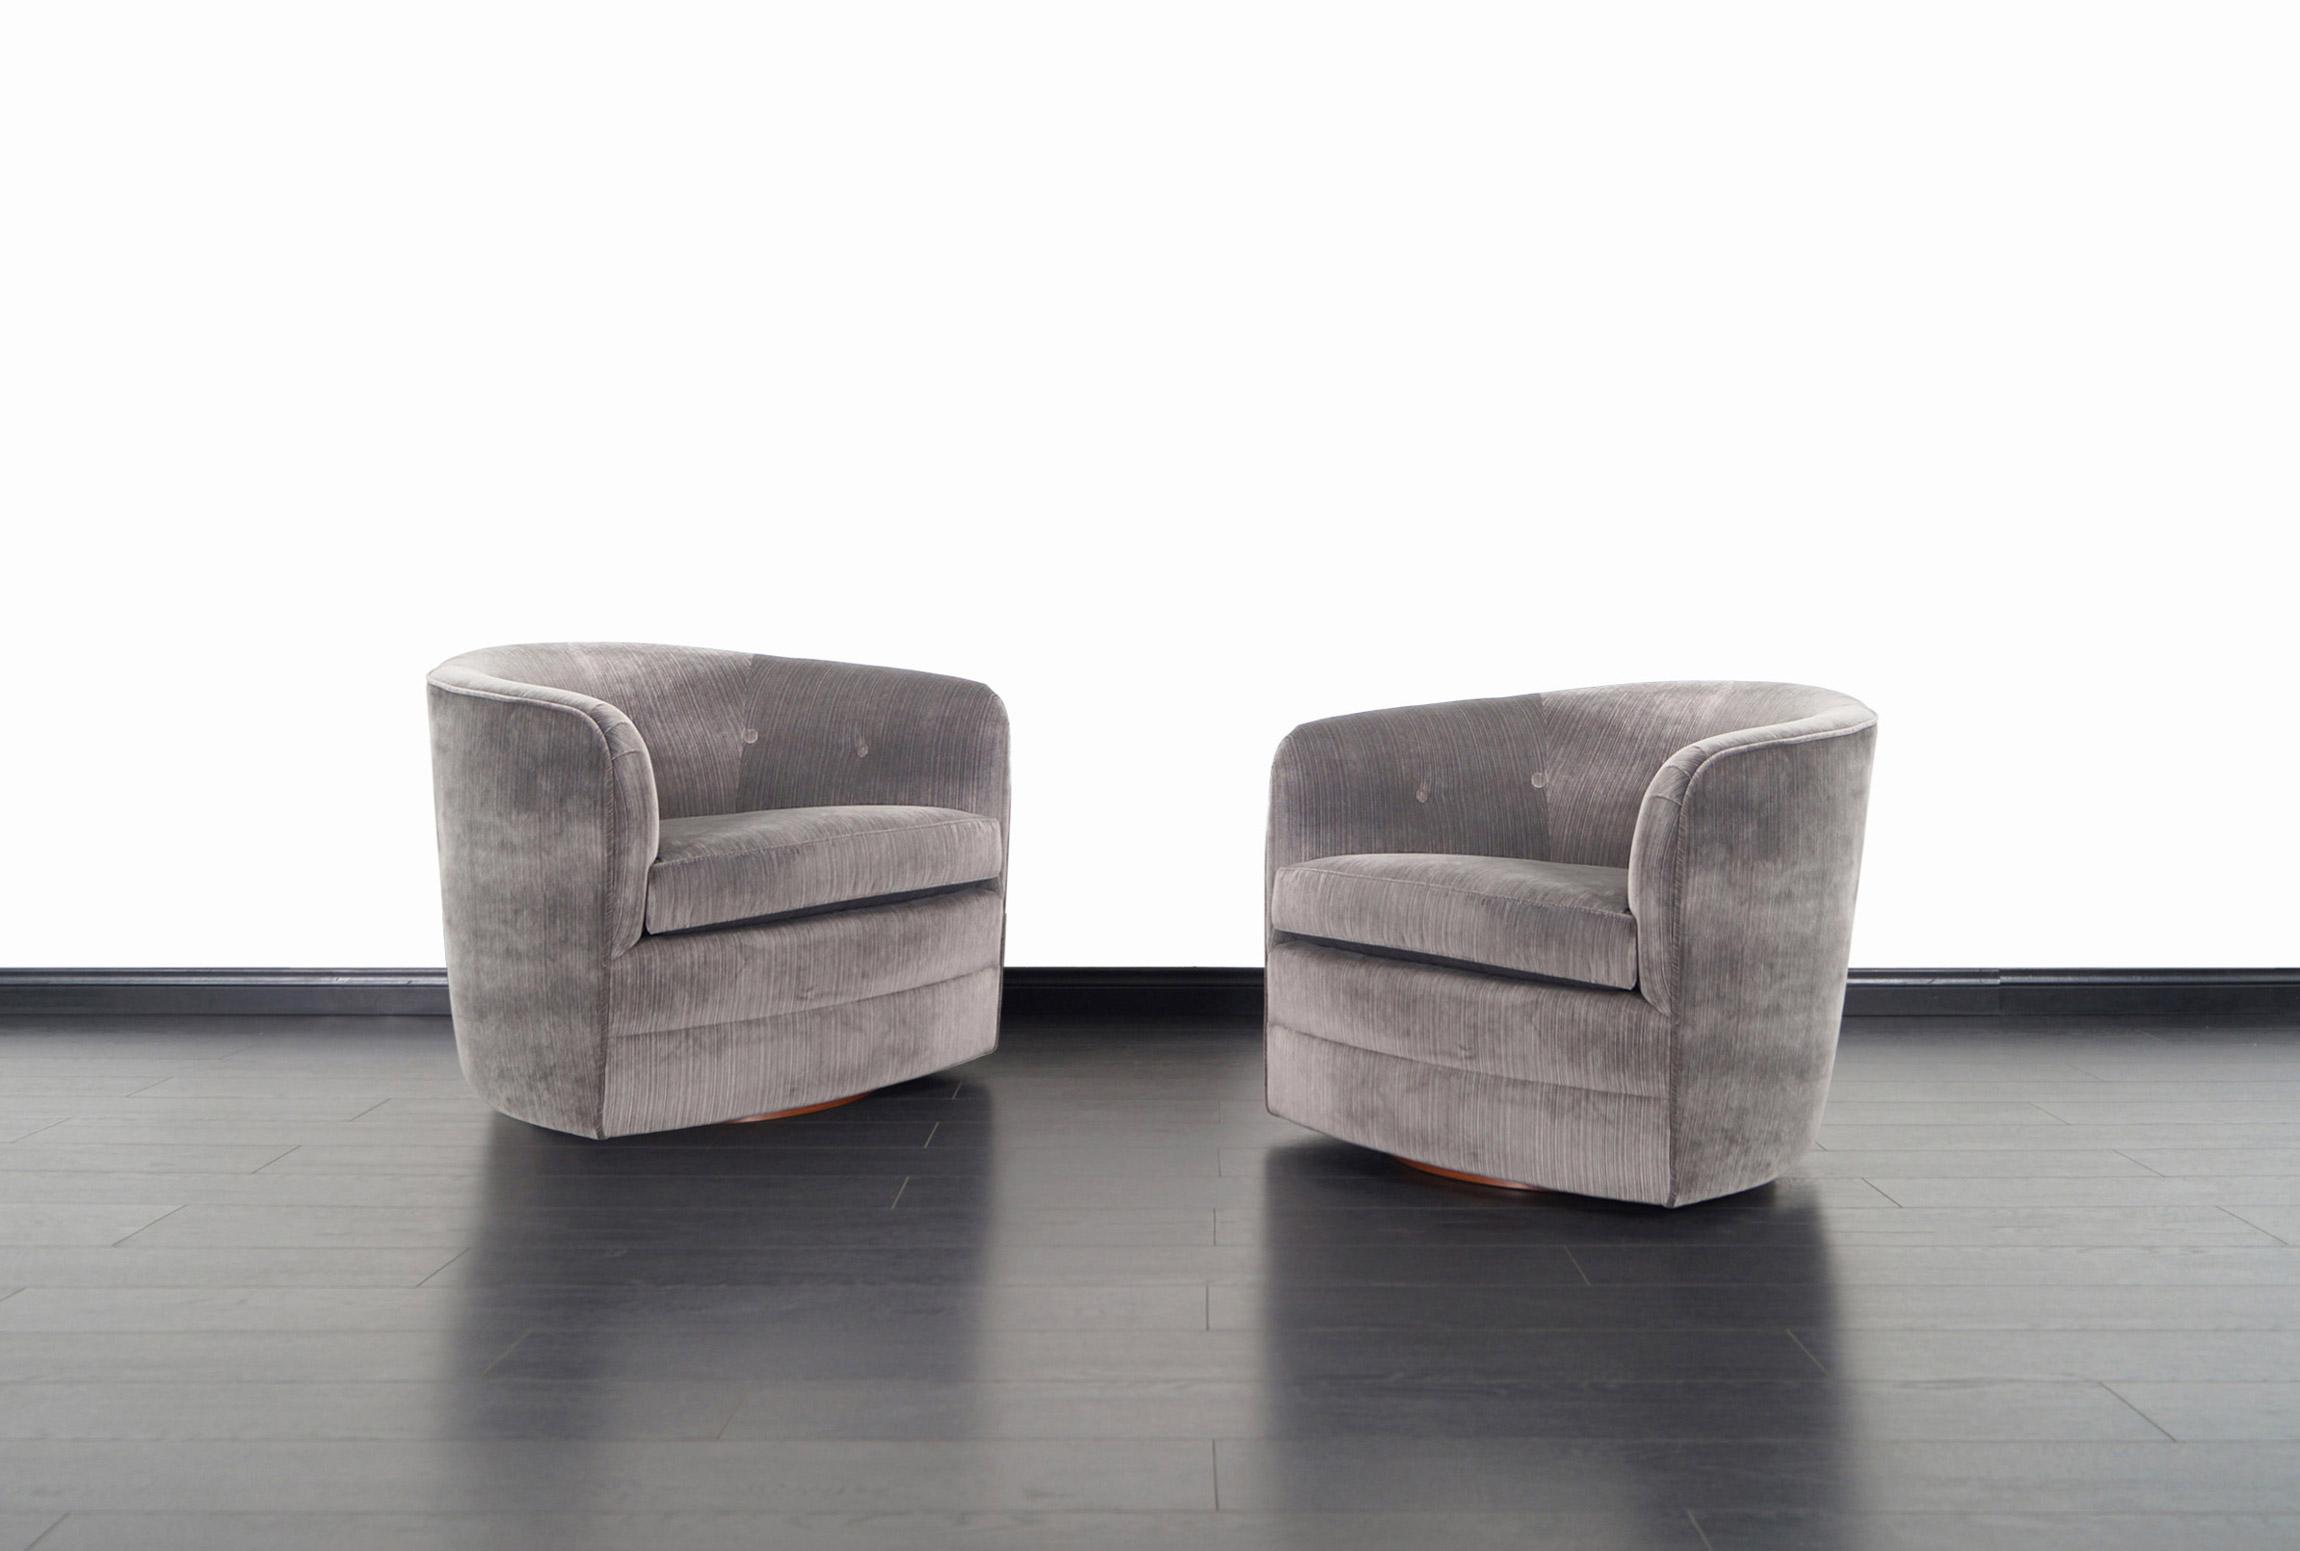 Vintage Walnut Swivel Lounge Chairs by Milo Baughman